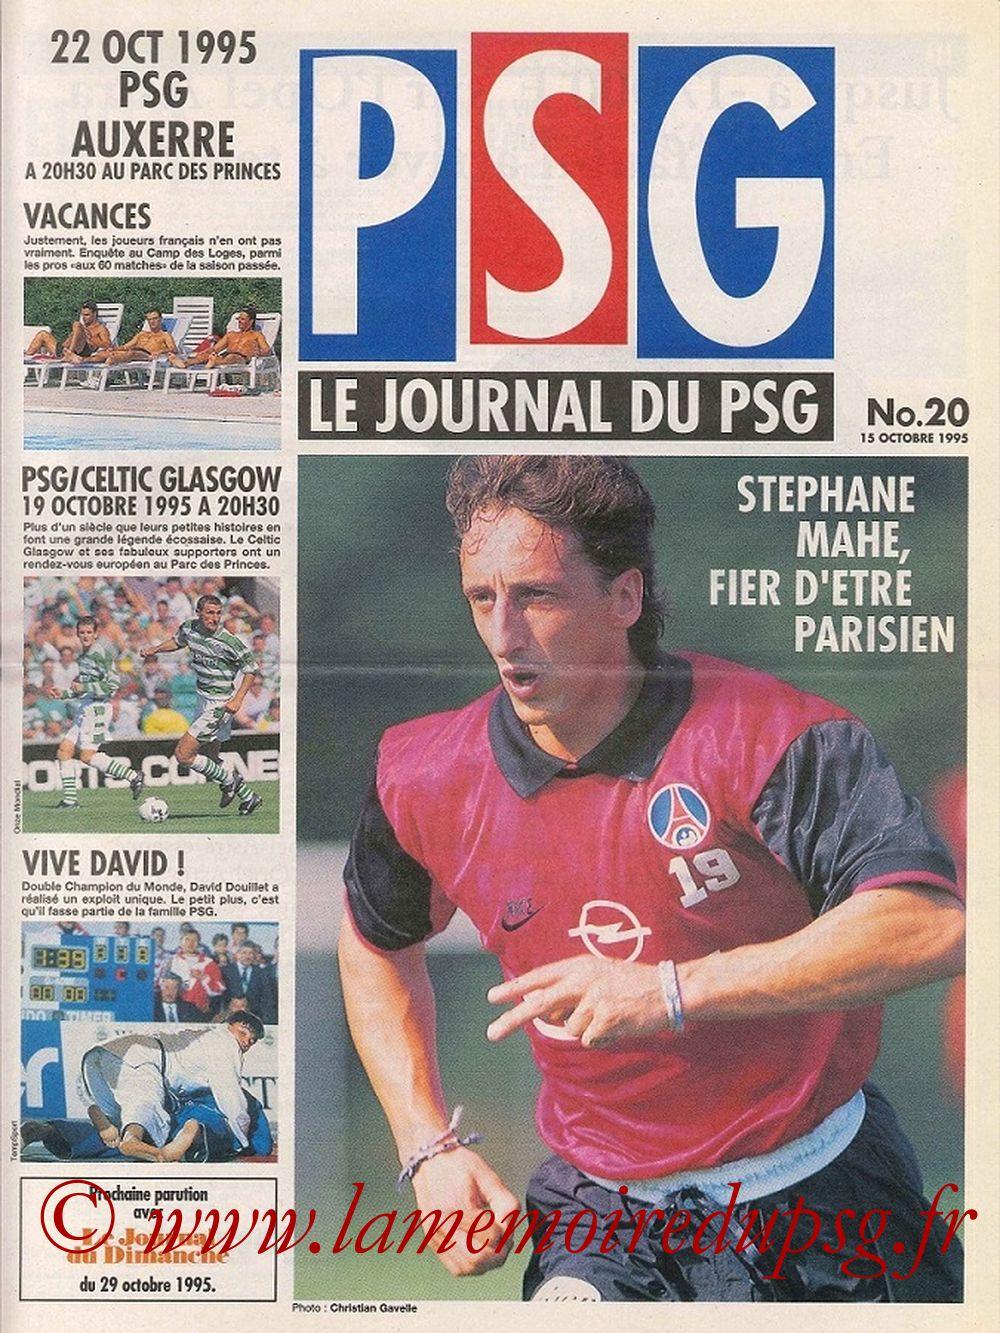 1995-10-19  PSG-Celtic (8ème Finale Aller C2, Le journal du PSG N°20)